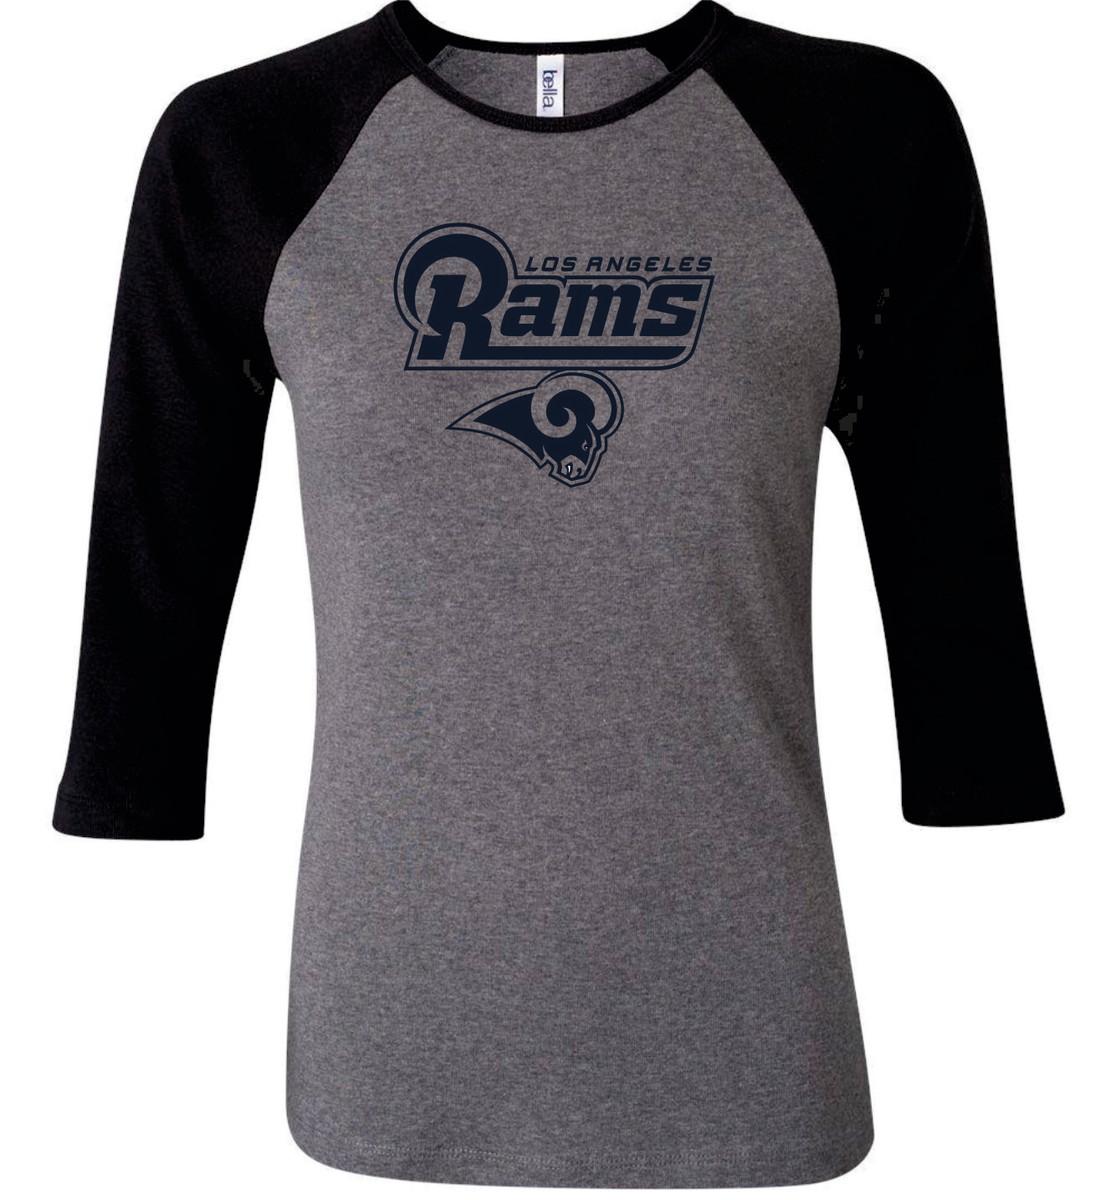 1df111a18 Camiseta Raglan 3 4 Los Angeles Rams Futebol Americano Nfl no Elo7 ...